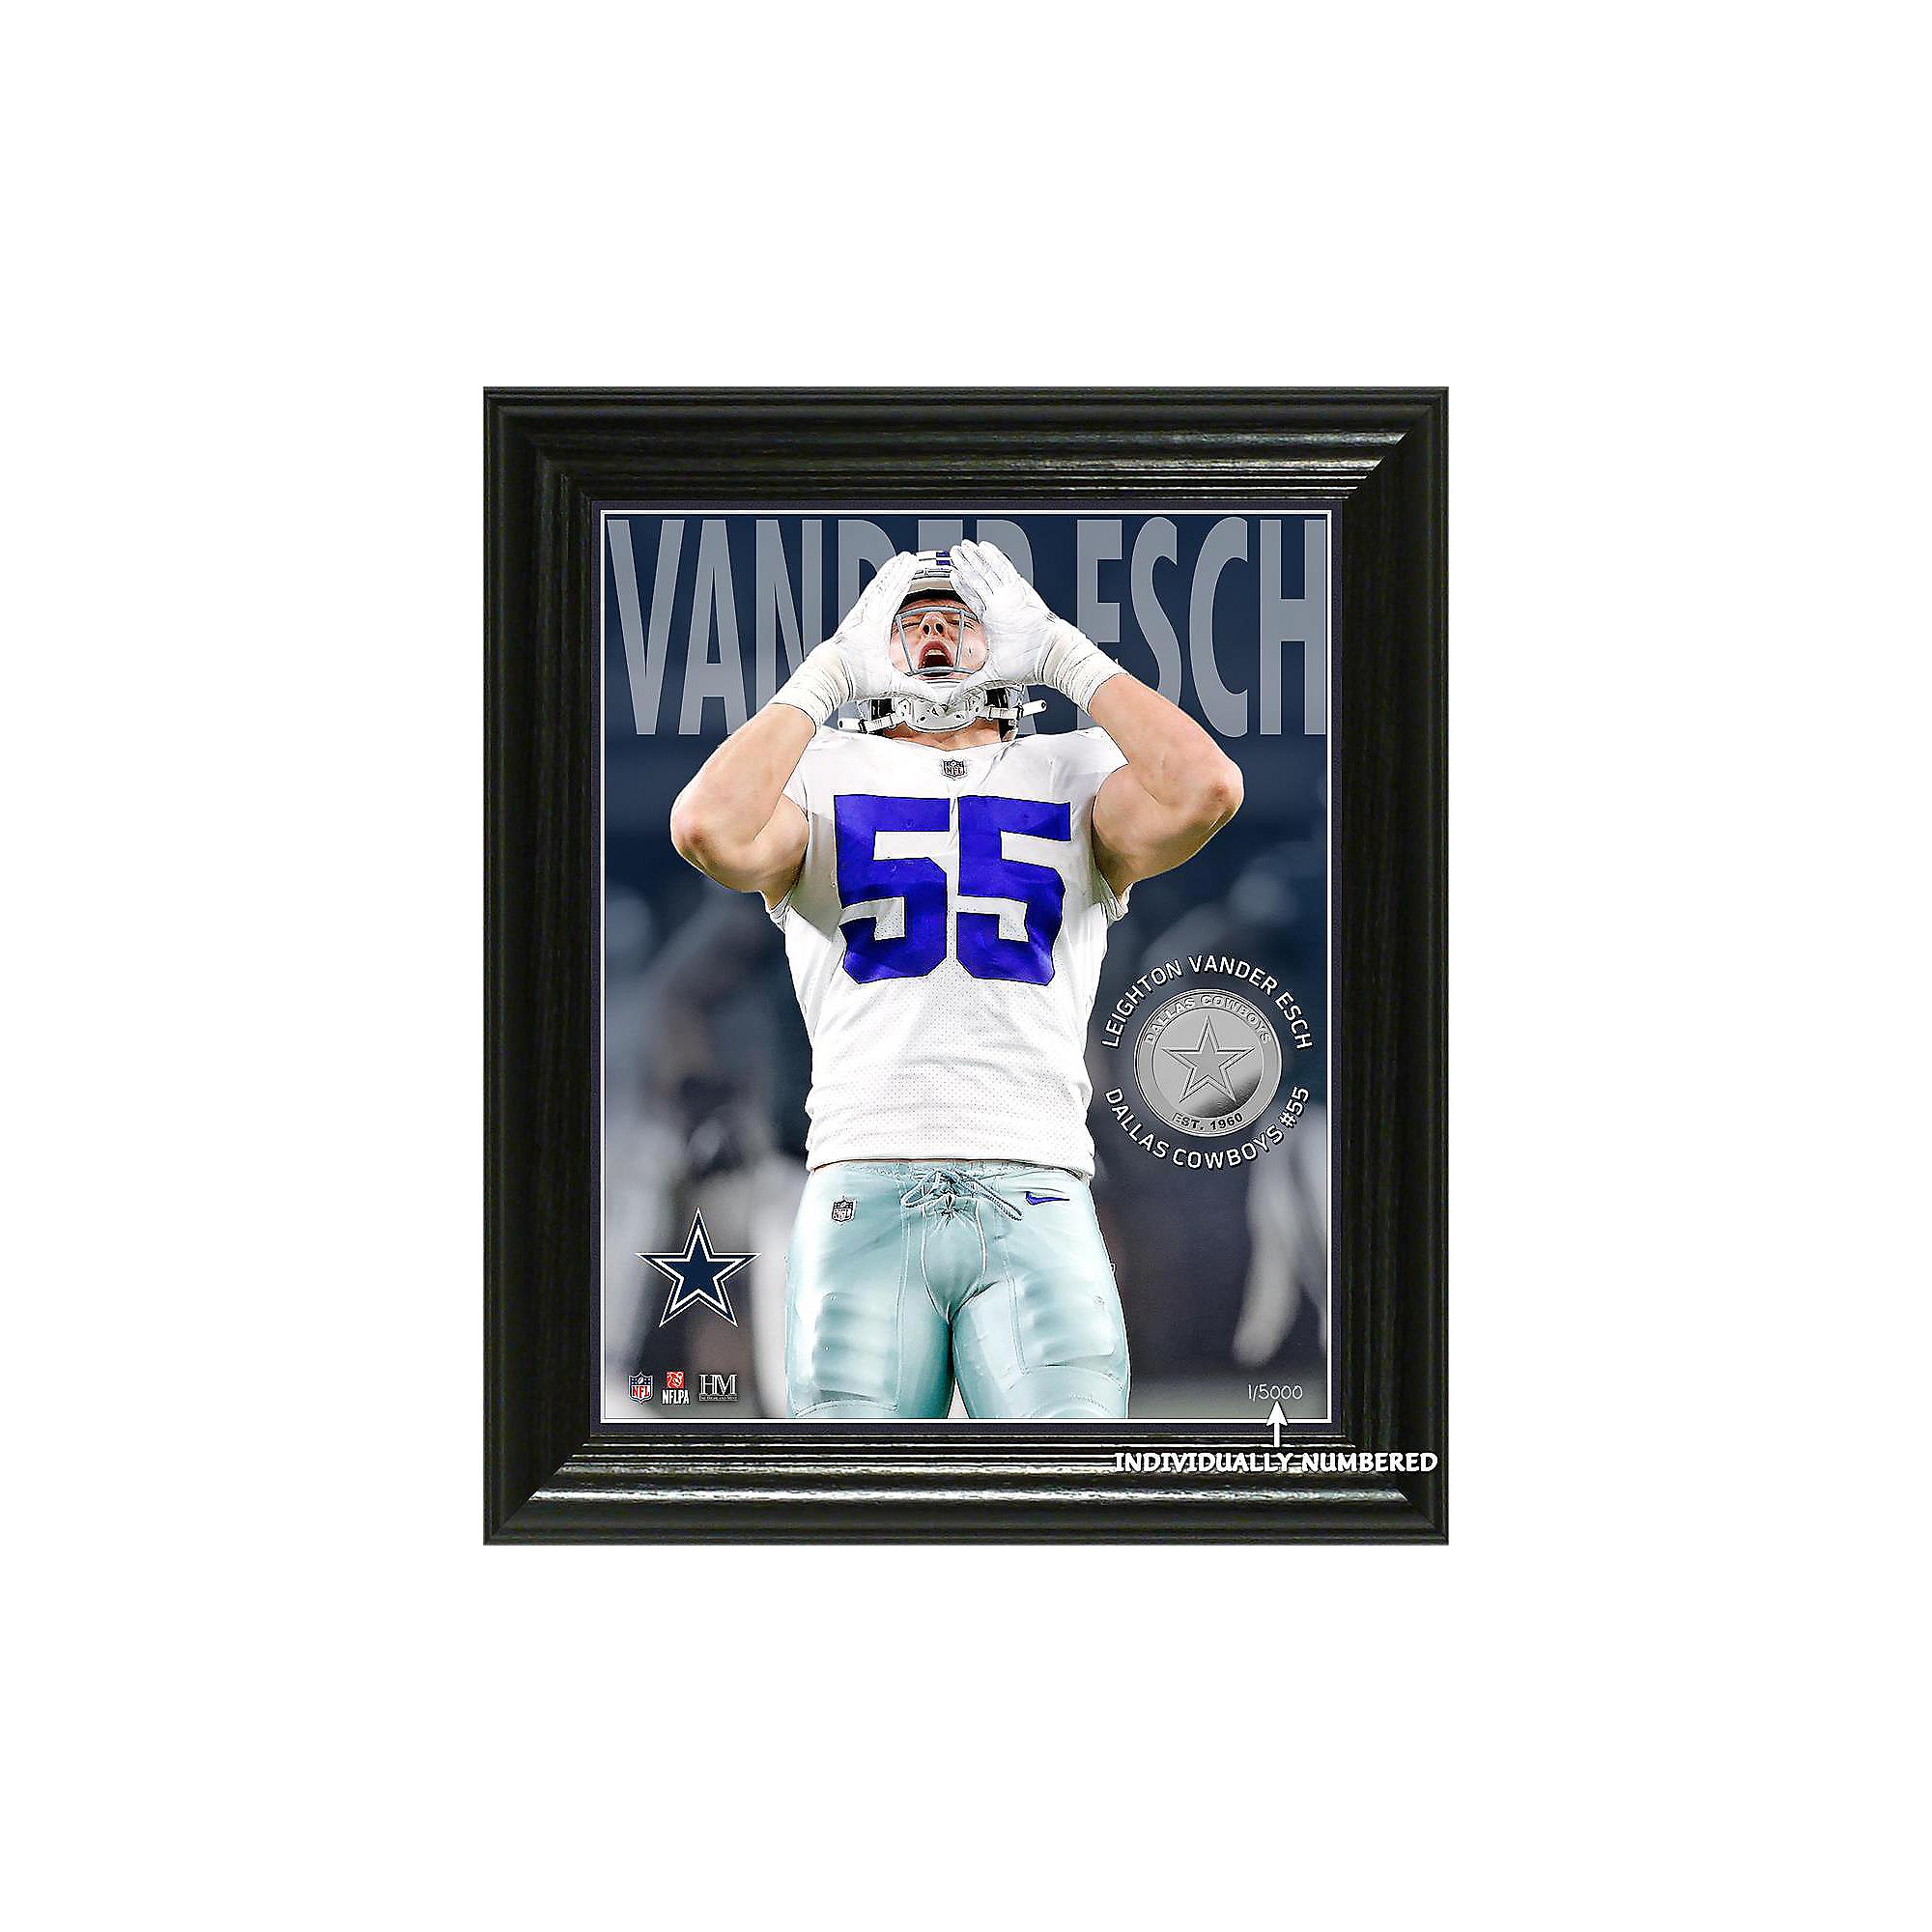 competitive price f46f2 f5894 Dallas Cowboys Leighton Vander Esch 3D Elite Series Photo Mint Frame